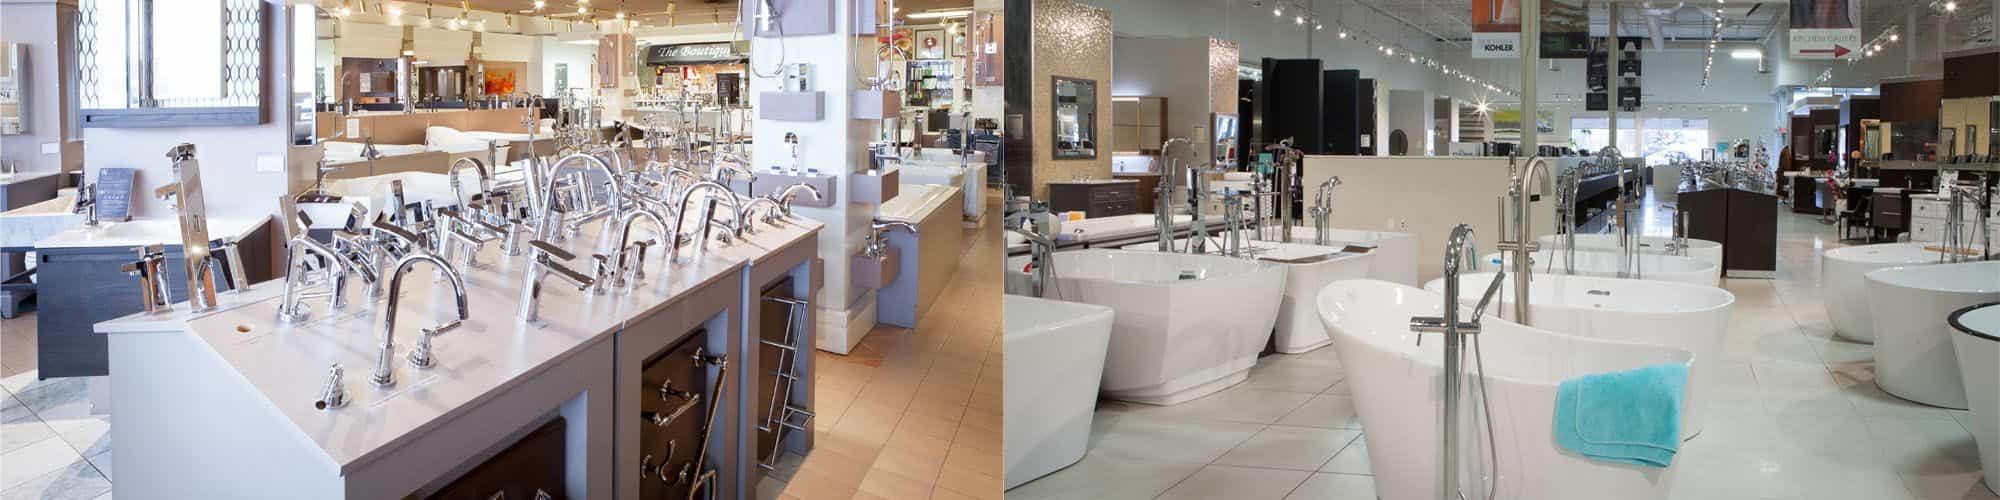 Bathroom Fixtures Store Details @house2homegoods.net